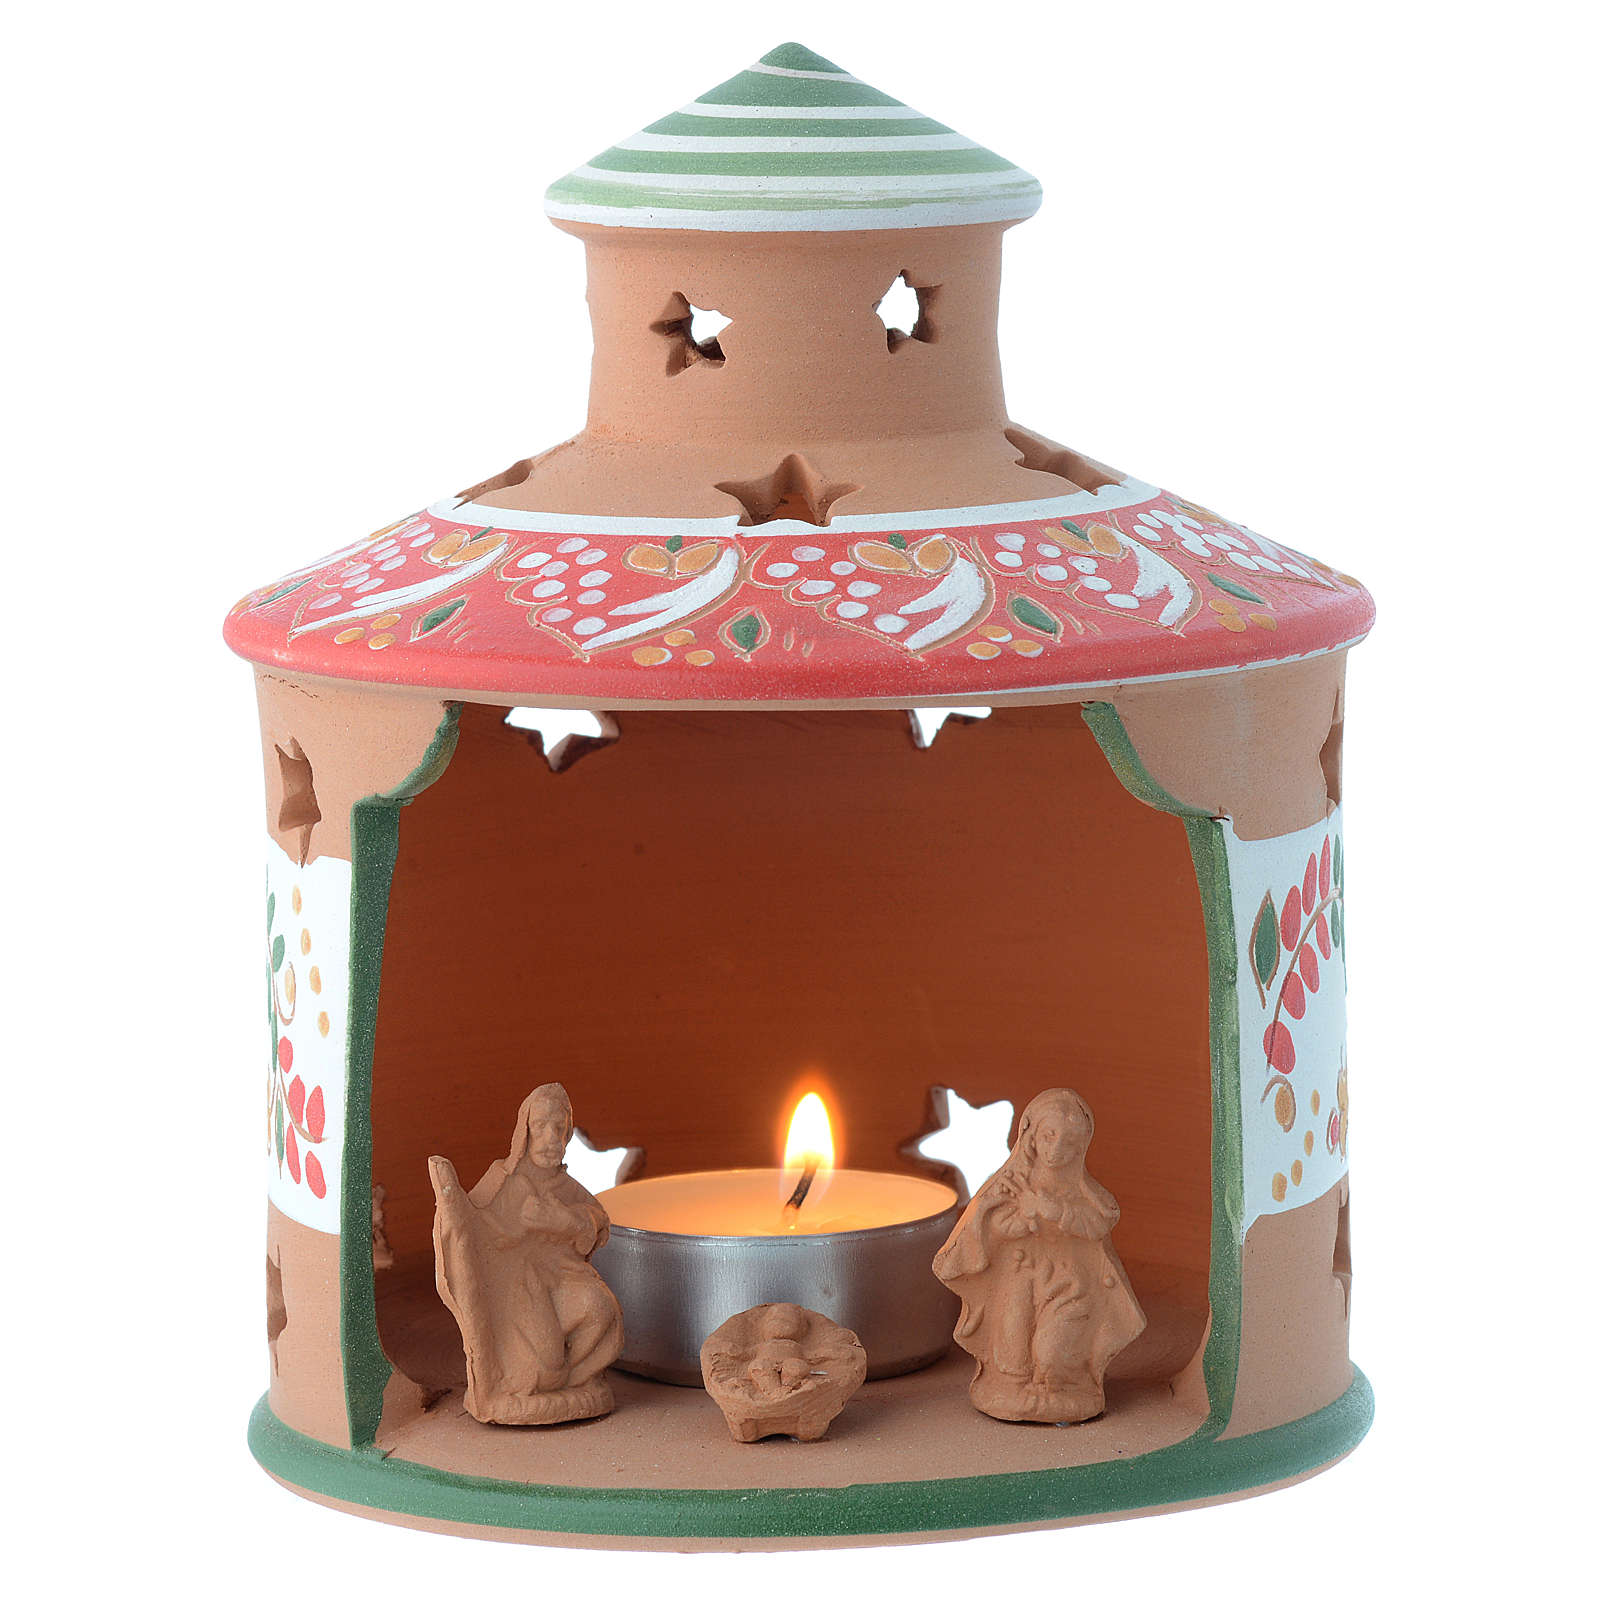 Cabaña candelero perforada de terracota Deruta 13 cm 4